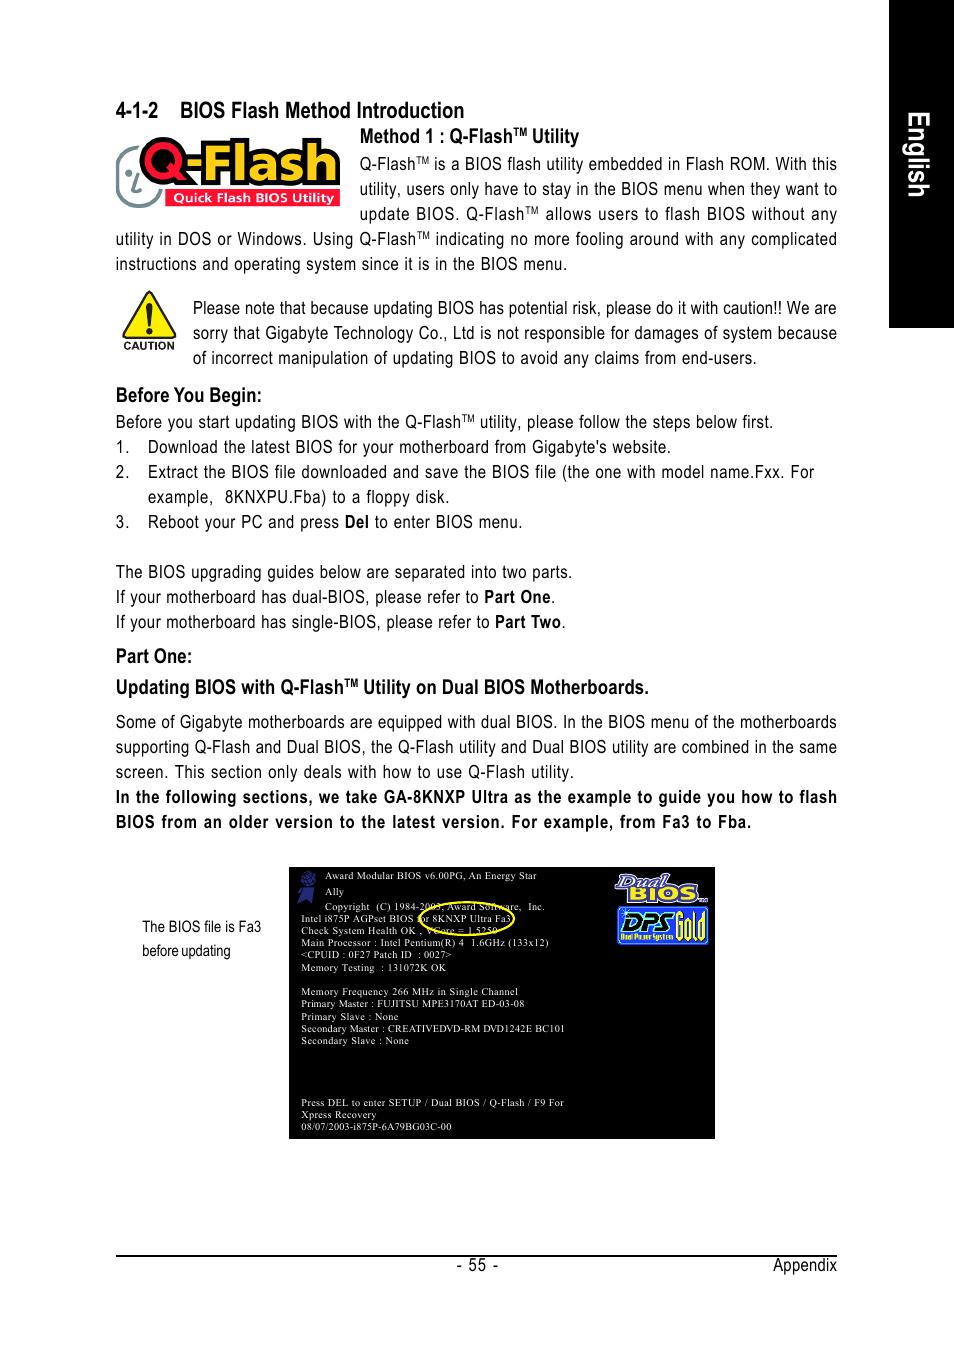 English, 1-2 bios flash method introduction, Method 1 : q